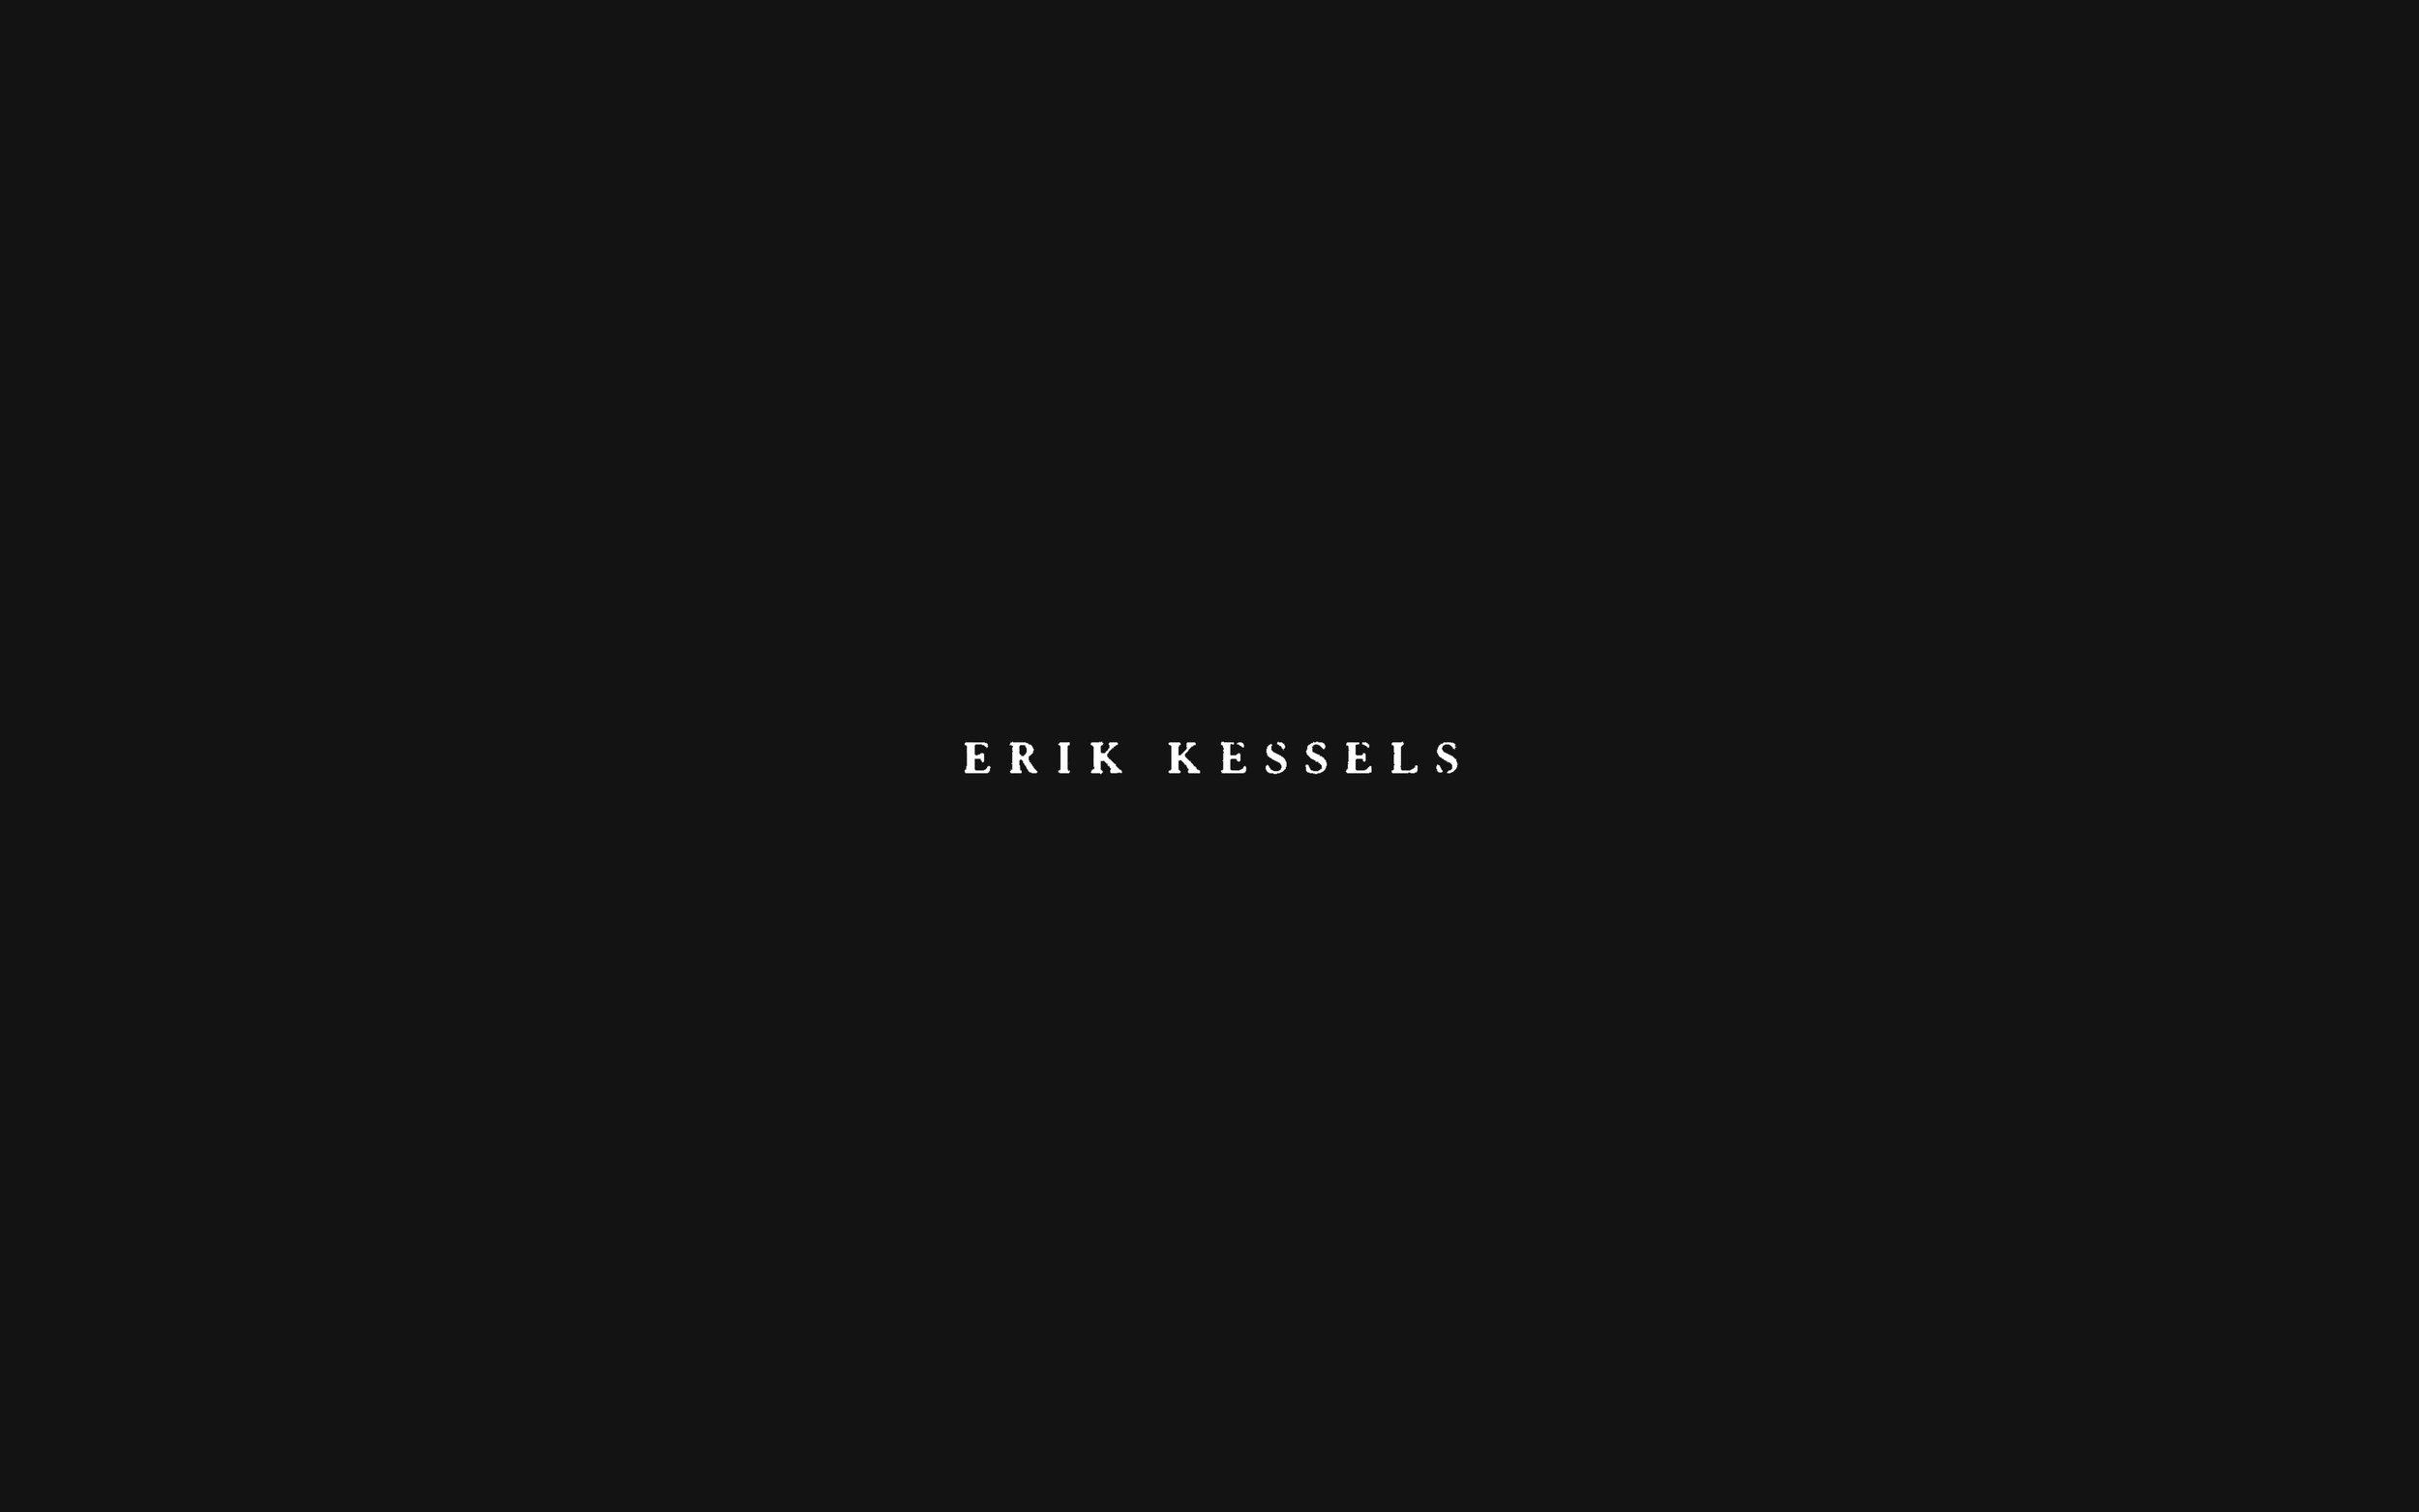 5A__Erik_Kessels_00.jpg